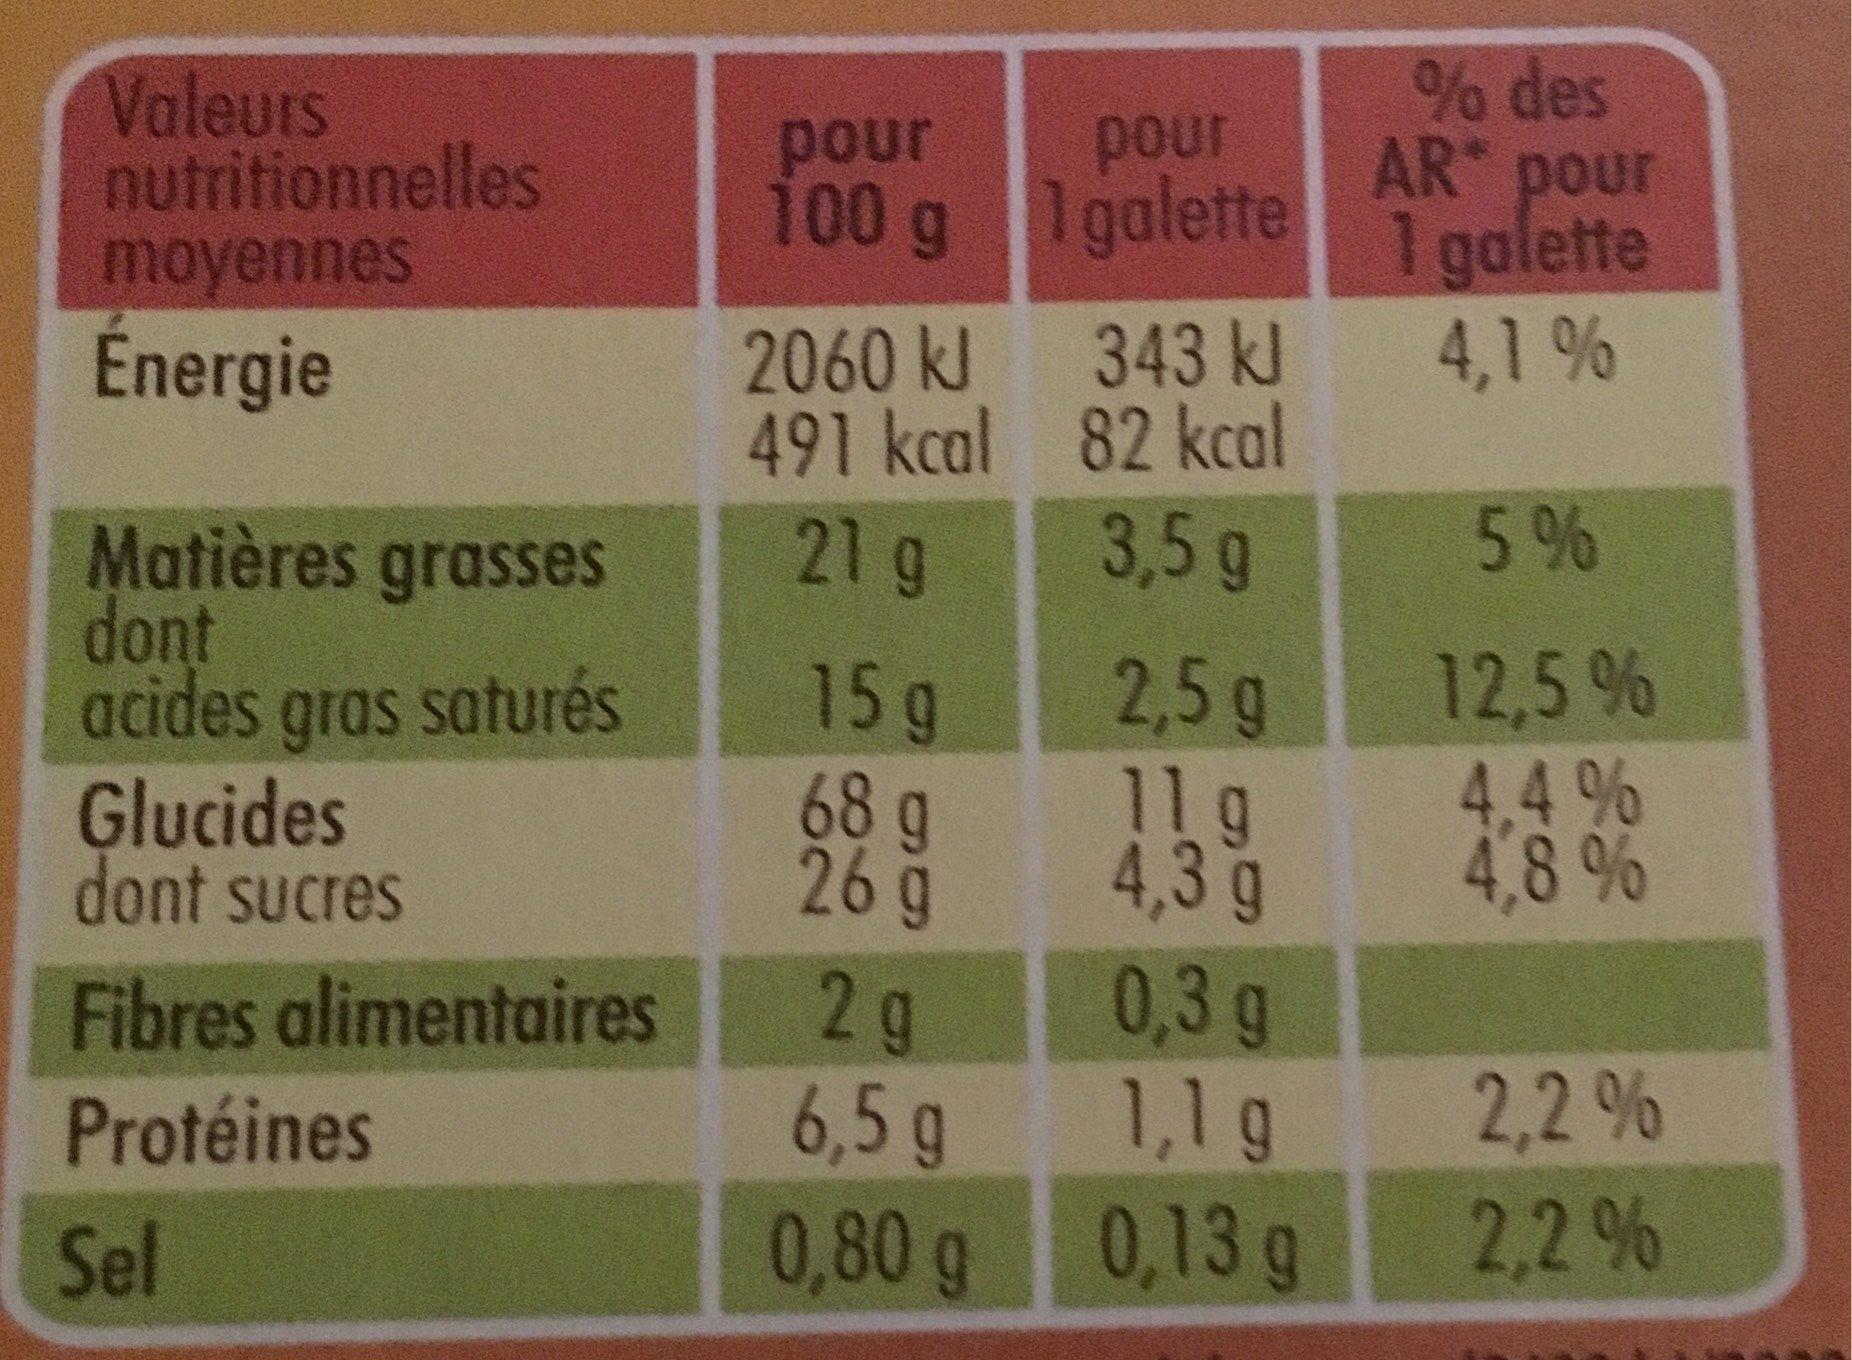 La Grande Galette 1905 - Nutrition facts